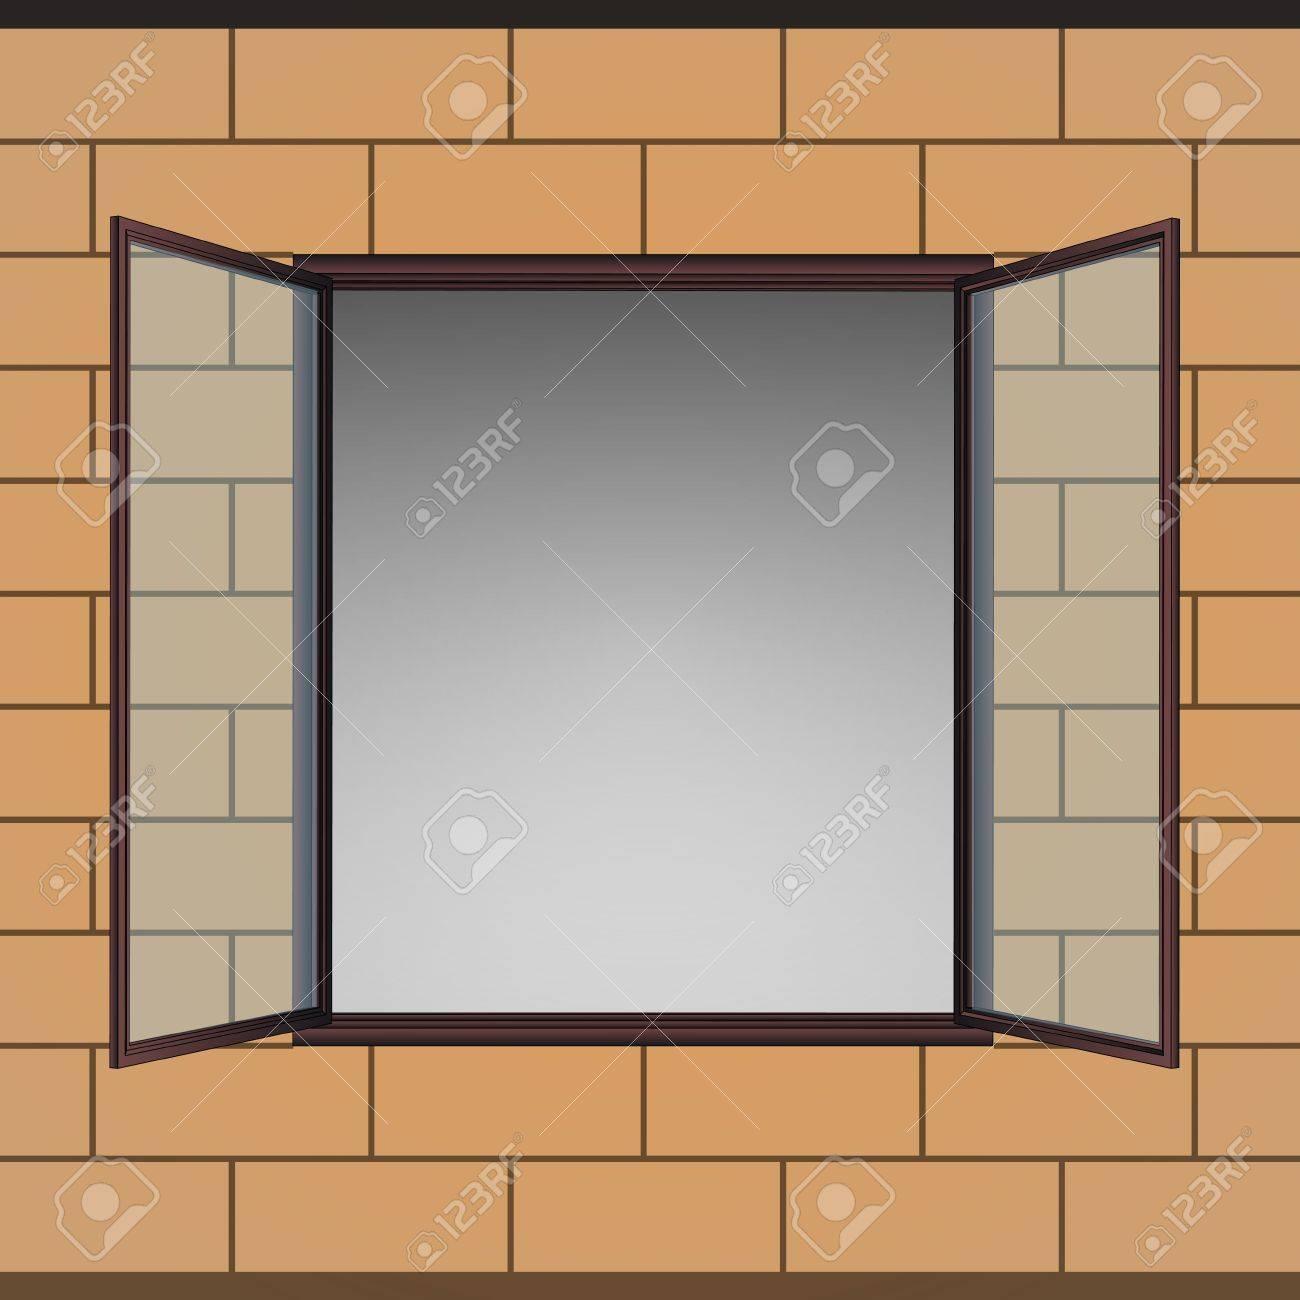 opened window in brick facade vector drawing illustration Stock Vector - 21015592